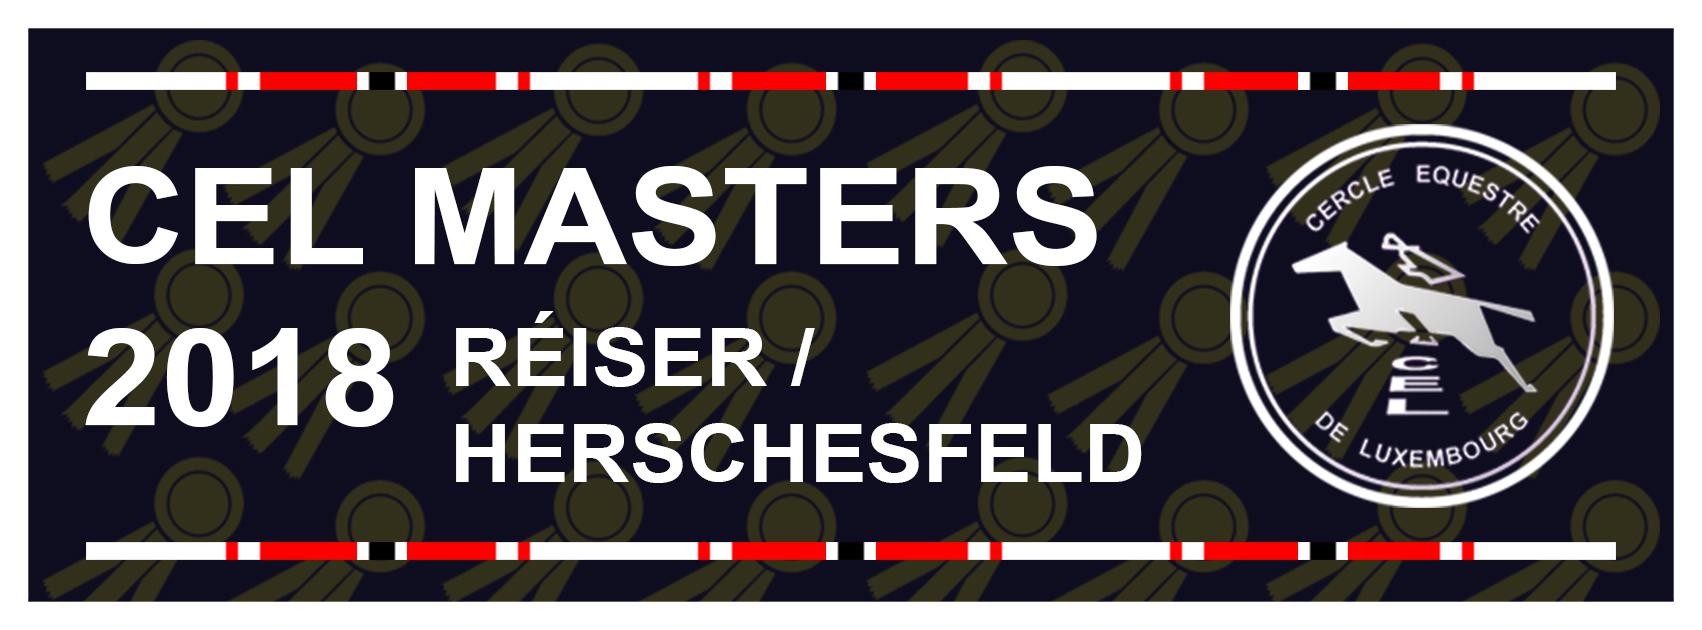 CEL Masters kann haut ab 18:00 Auer genannt ginn !!!